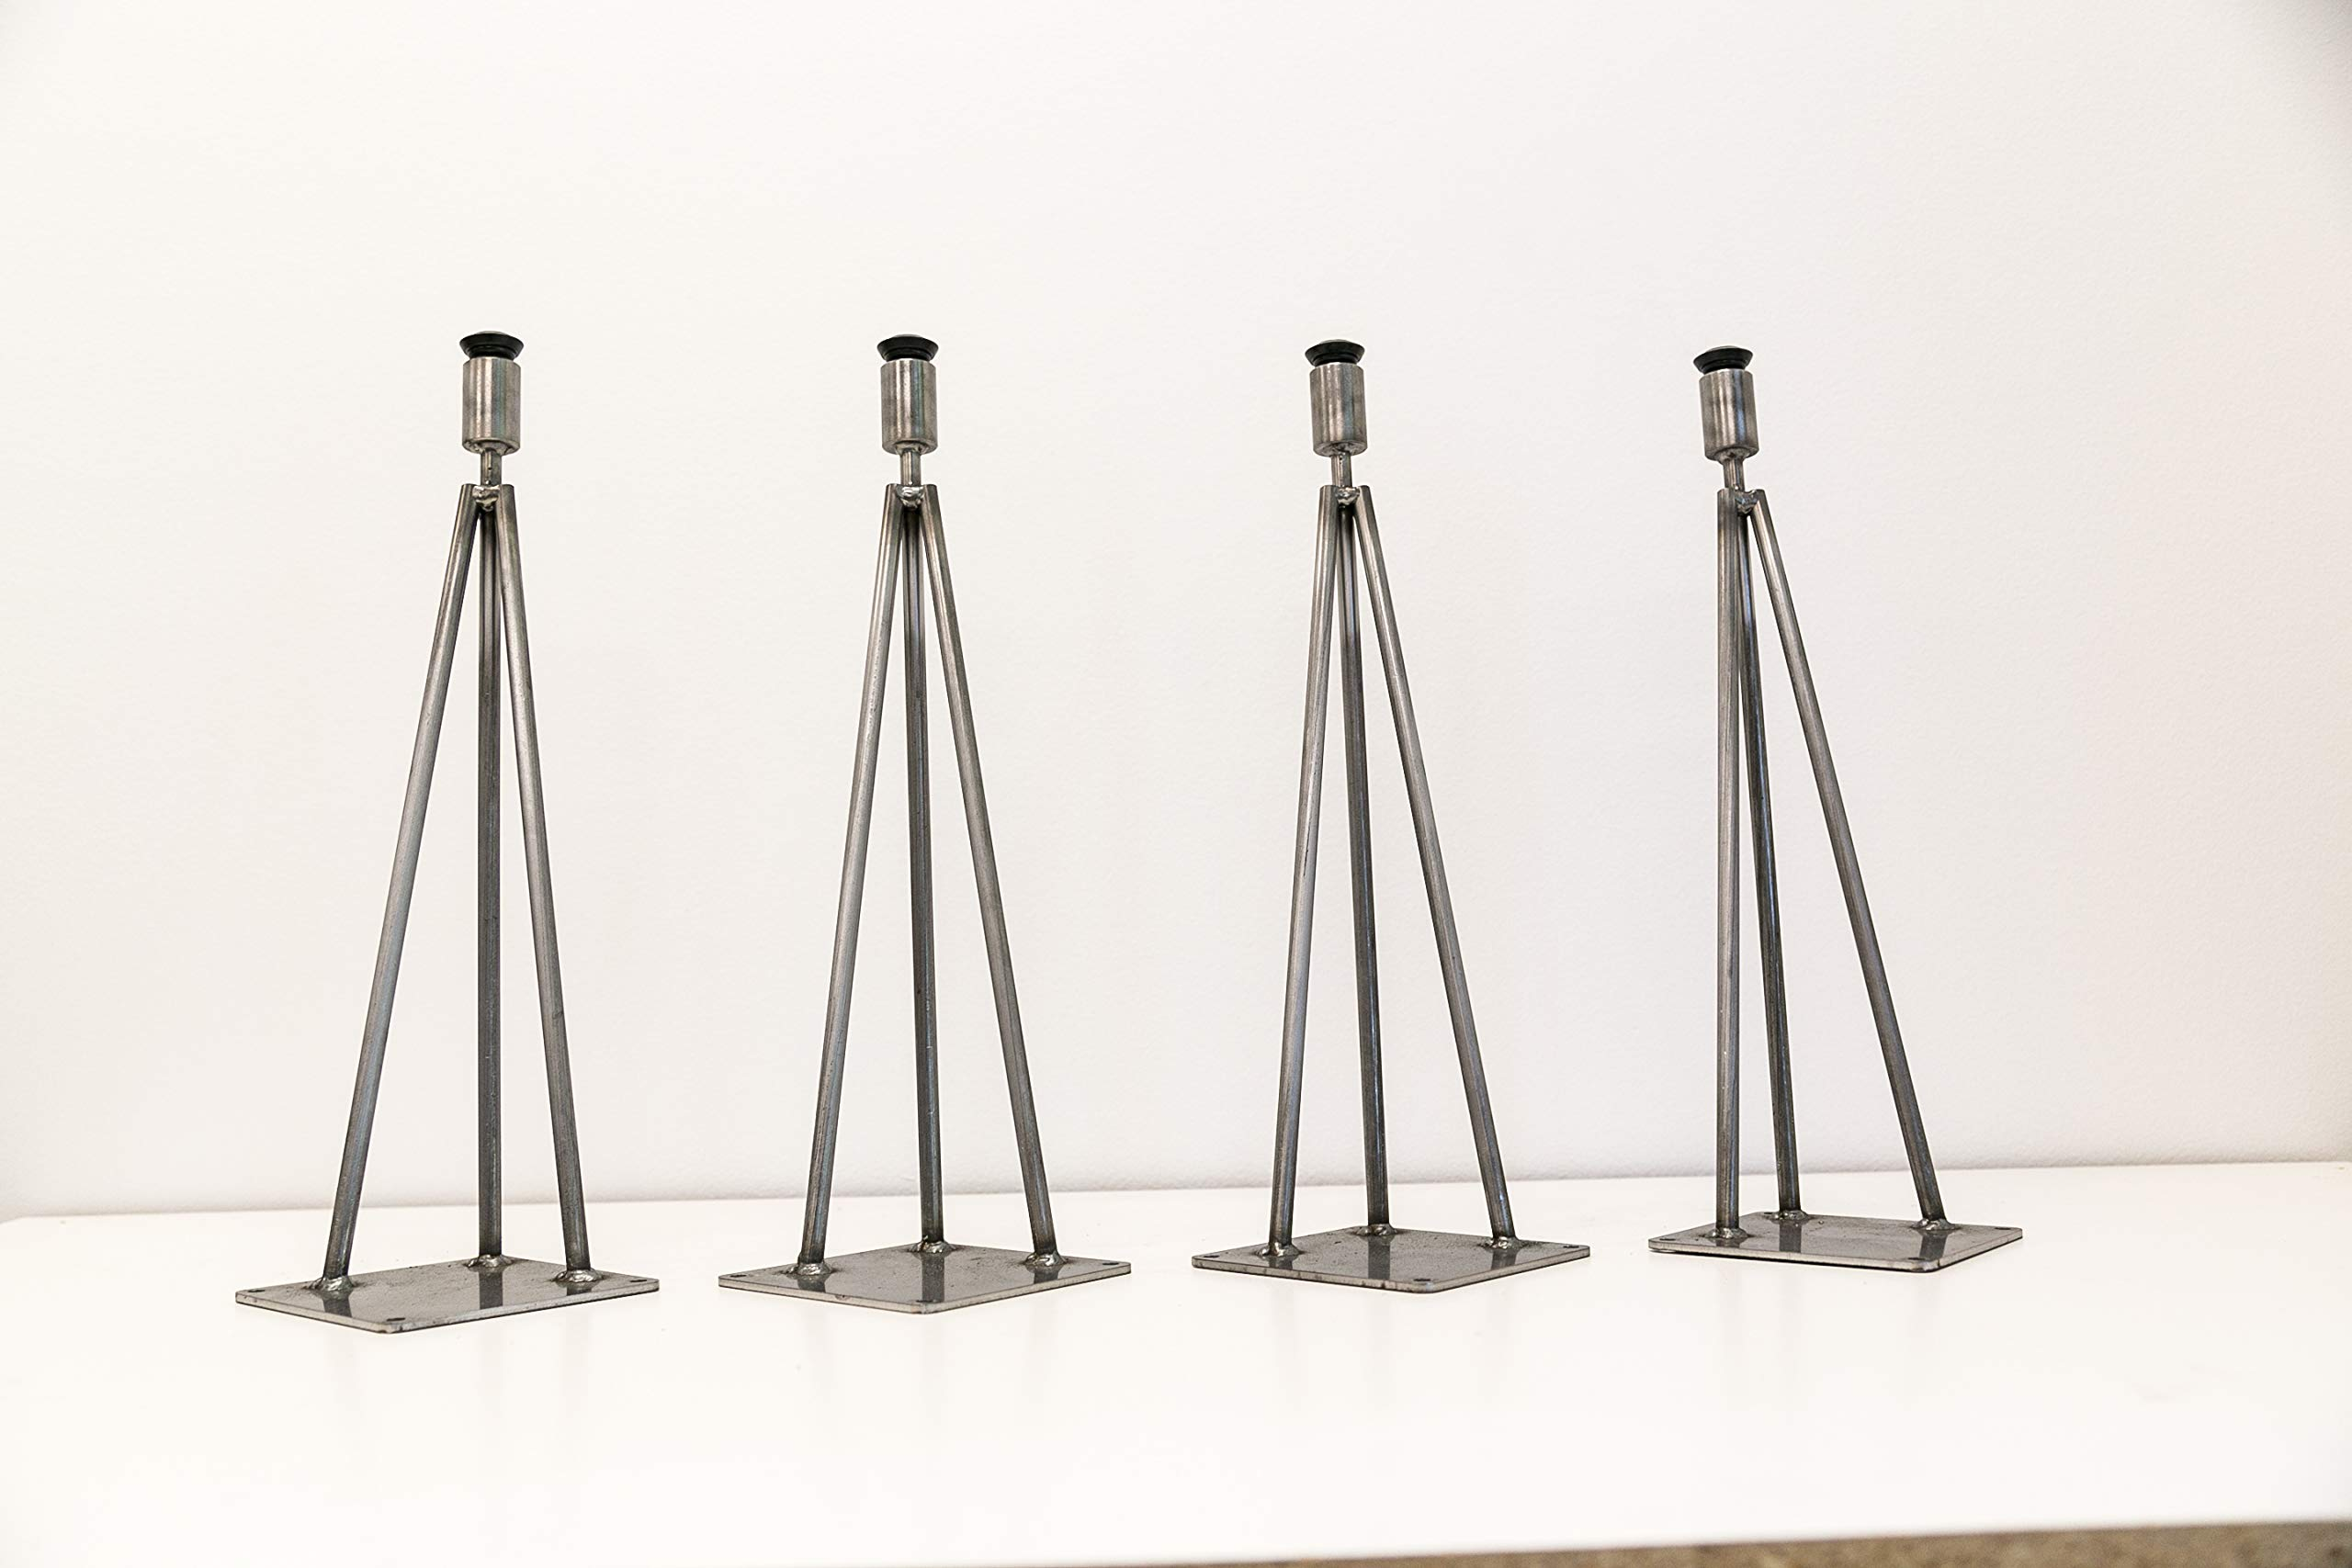 Barn XO Hairpin Leg, Metal Table Leg Set of (4),Modern Industrial, 3-Rod Hairpin Leveling Legs (18''H Bench/Coffee, Clear Matte) by Barn XO